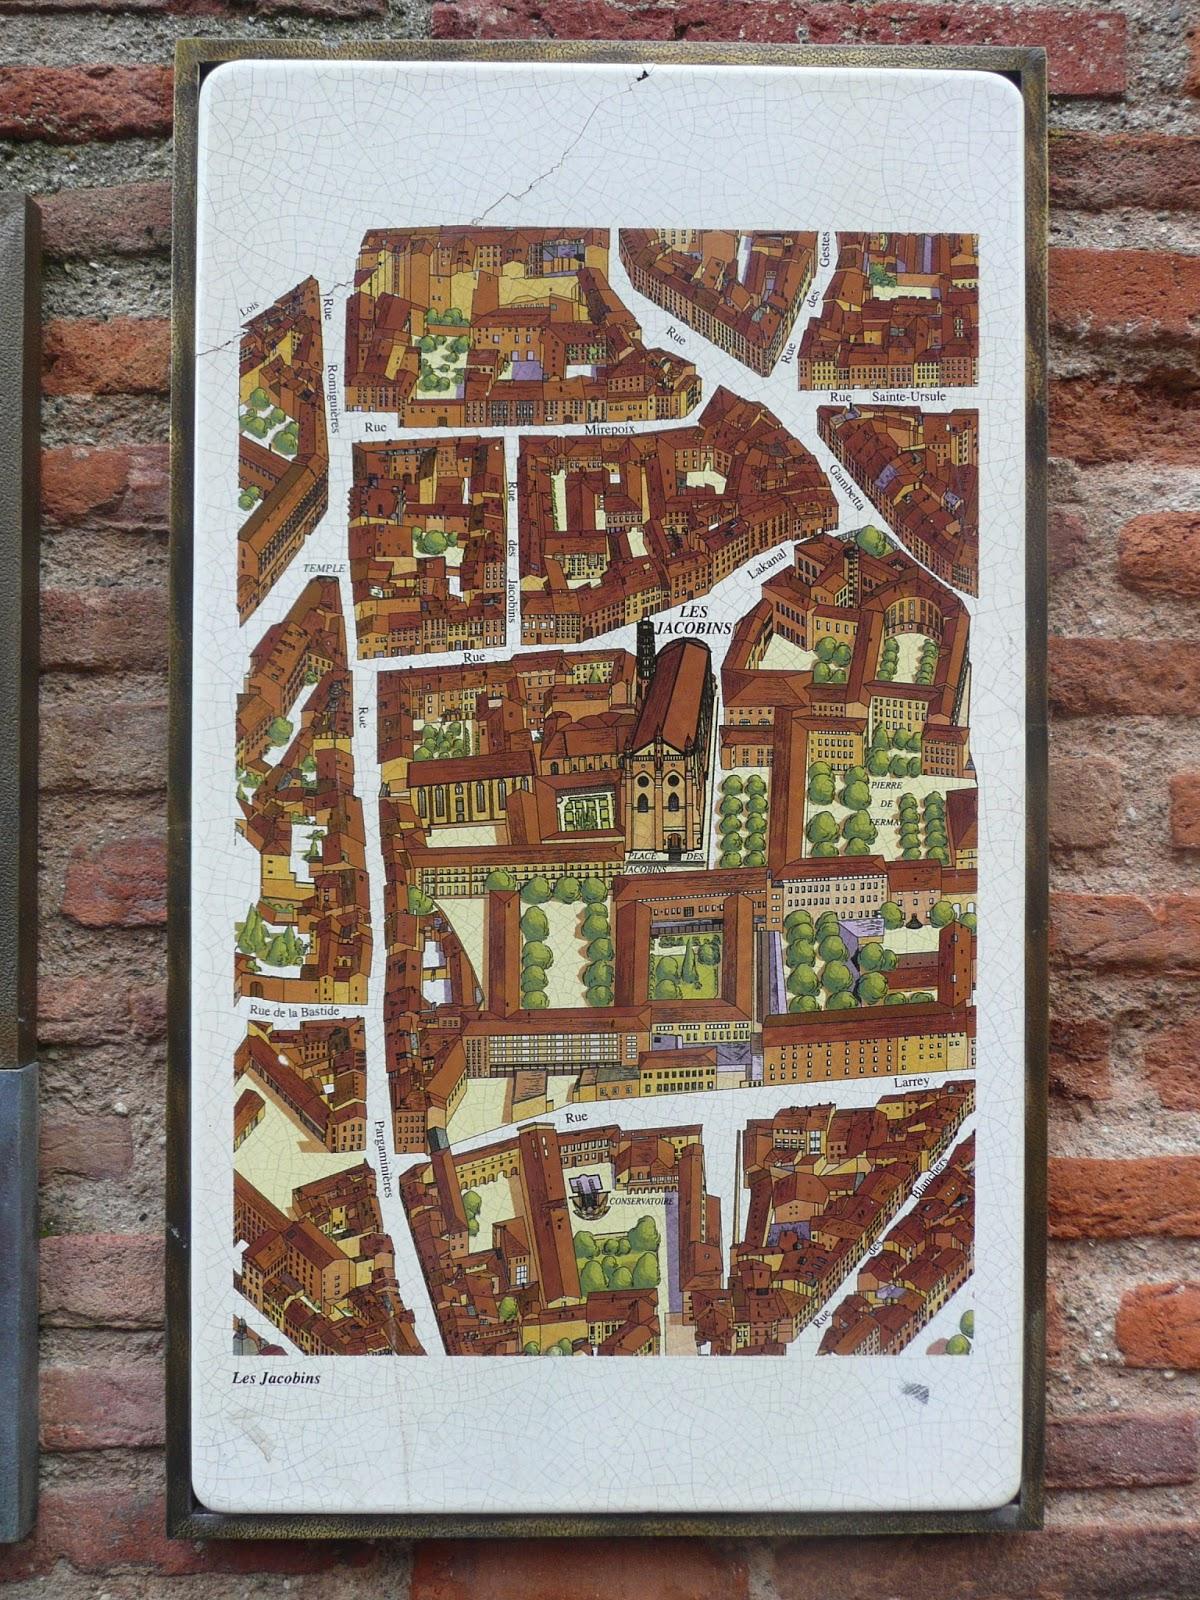 Mapa explicativo del centro urbano de Toulouse